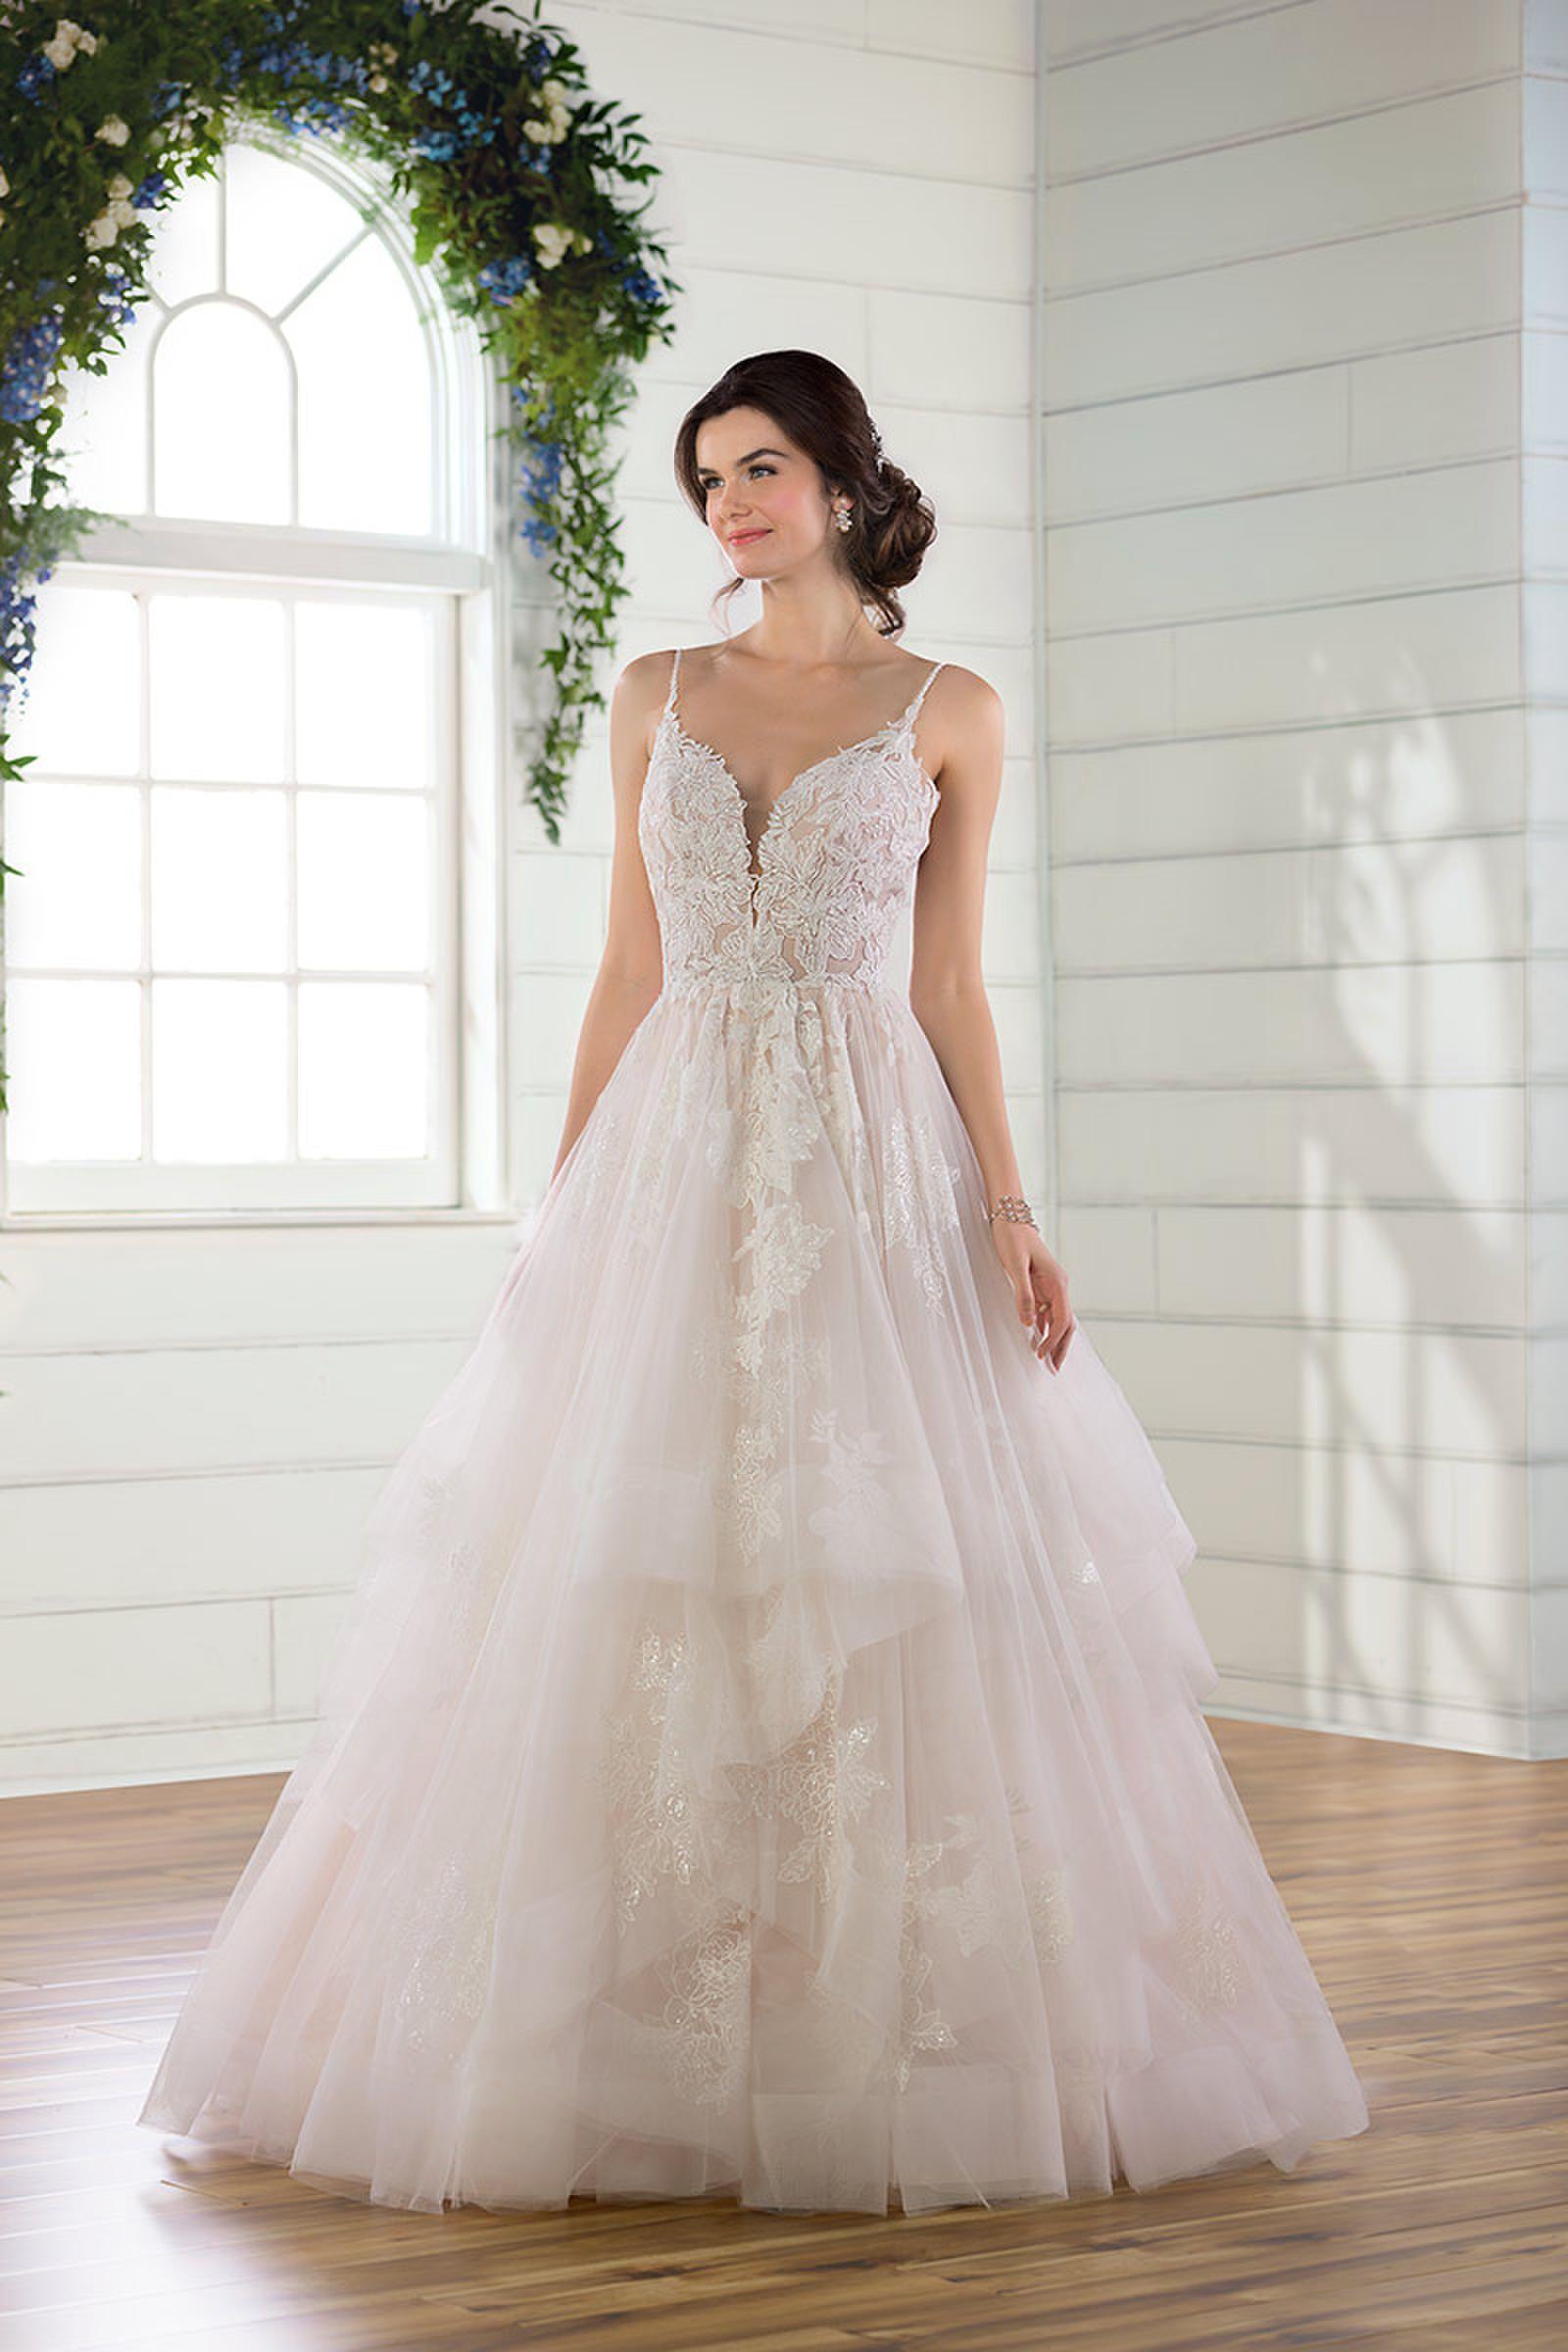 Woodbridge Ontario Say Yes To The Dress Canada Randy Fenoli Wedding Dresses Prom Dresses Evening Wear In 2020 Essense Of Australia Wedding Dresses Wedding Dresses Traditional Wedding Dresses